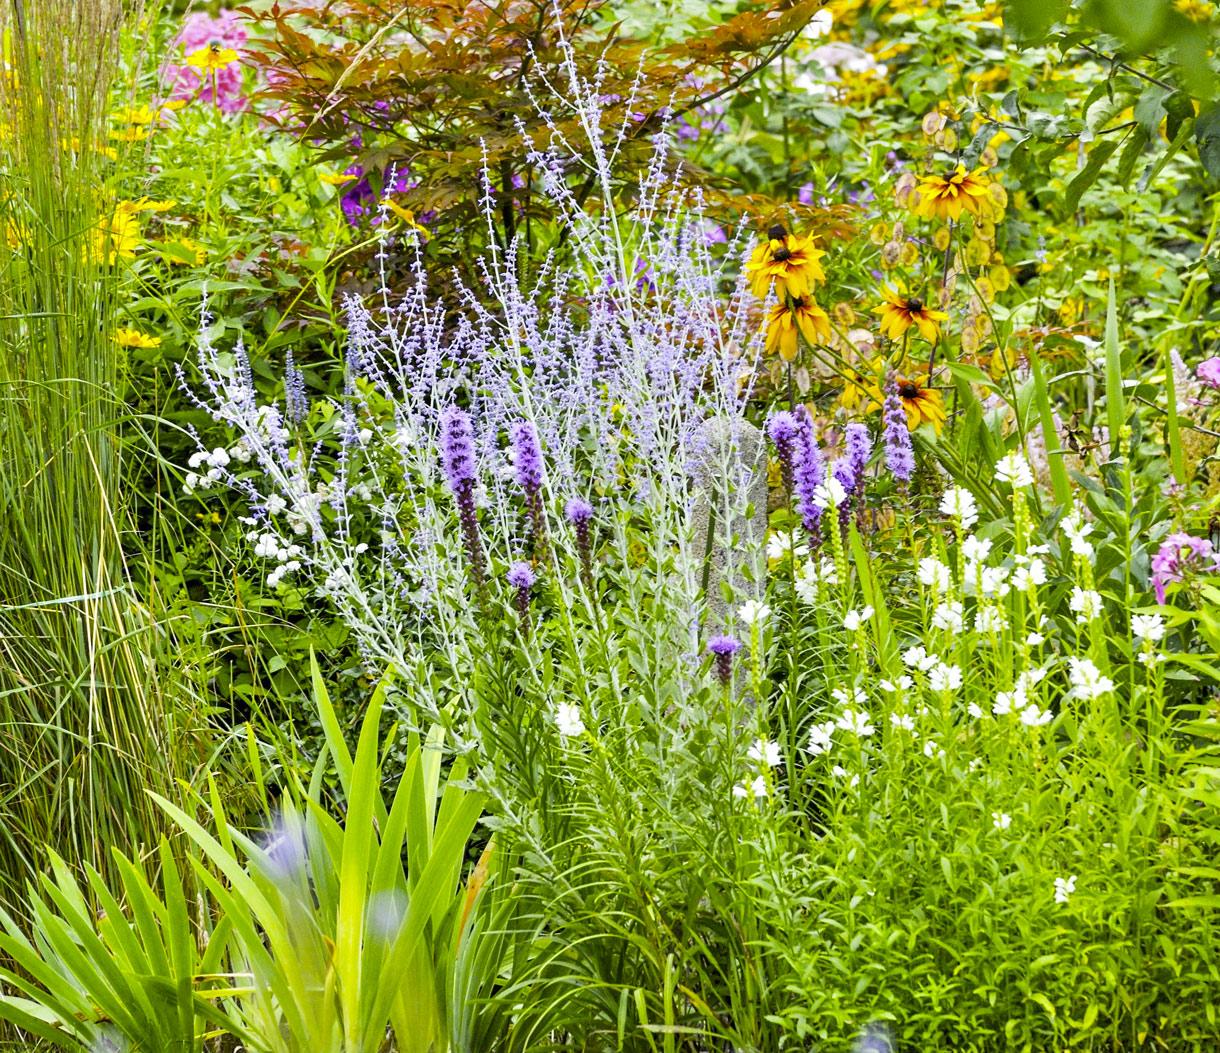 haie fleurie toute l annee arbuste a fleur et graminees detente jardin